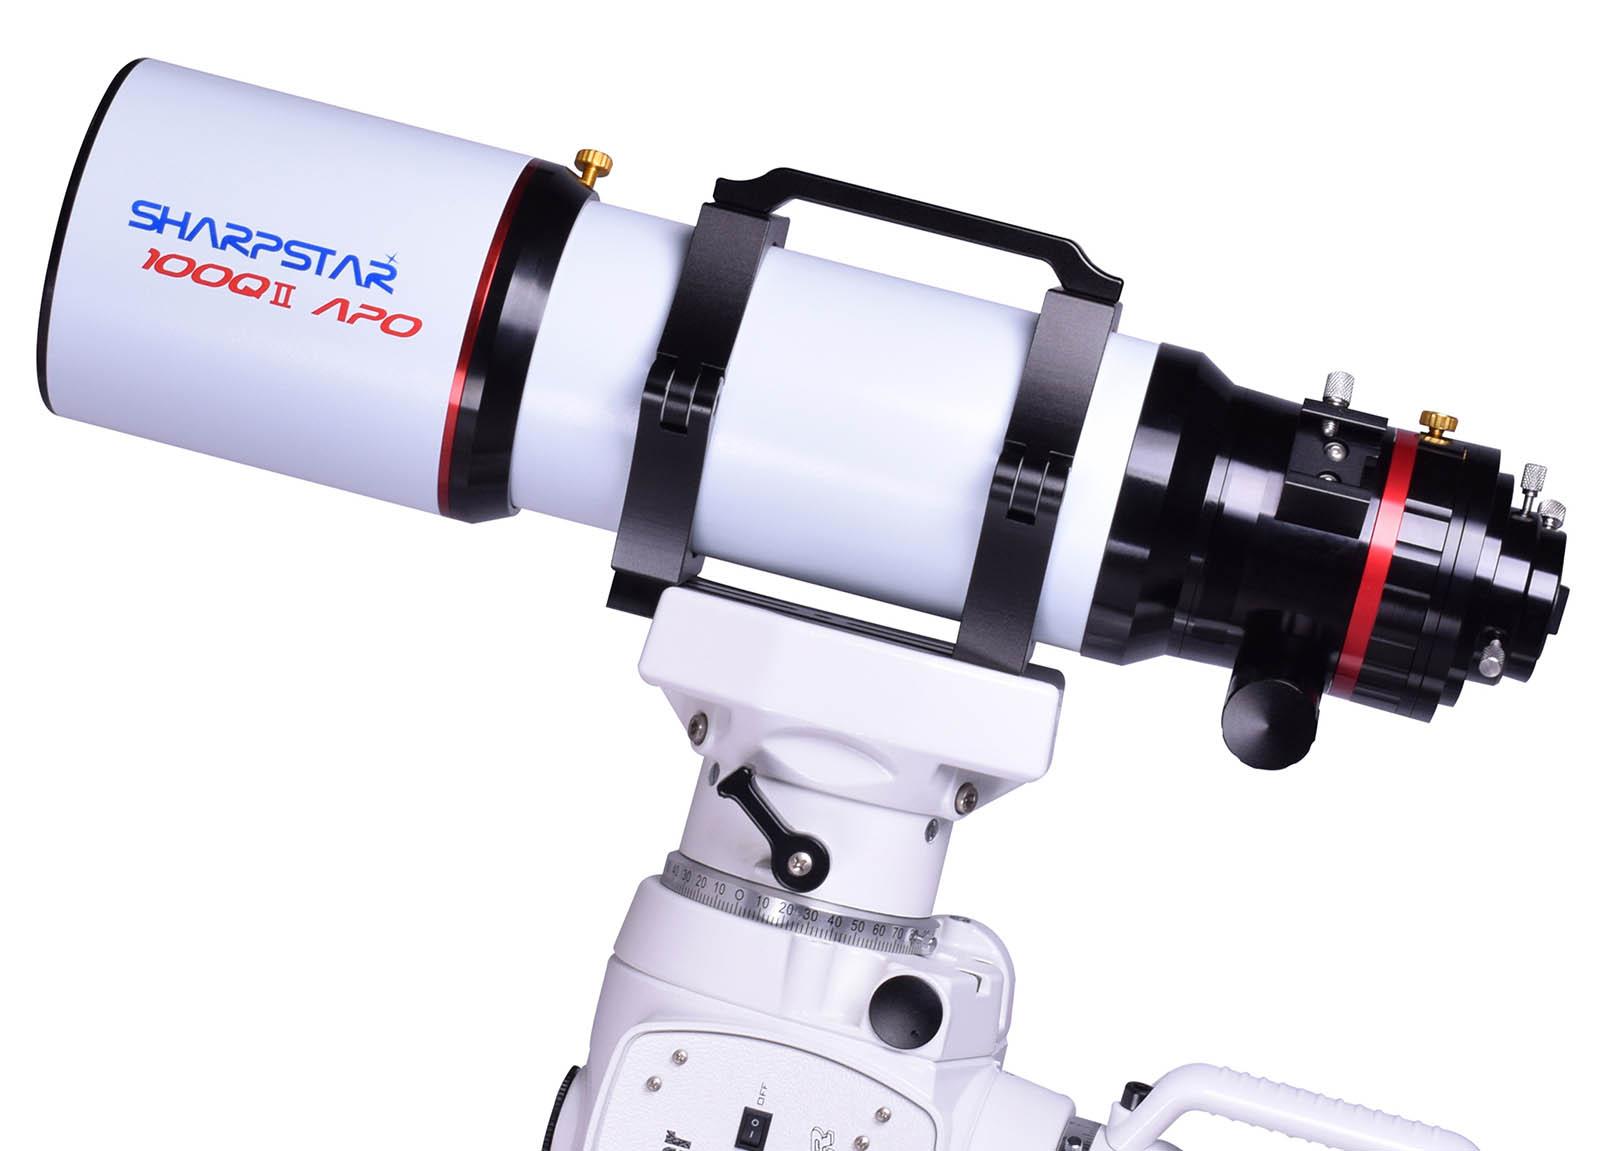 SharpStar 100QII 100mm f/5.8 Quadruplet Apochromatic Refractor Telescope - Mark II